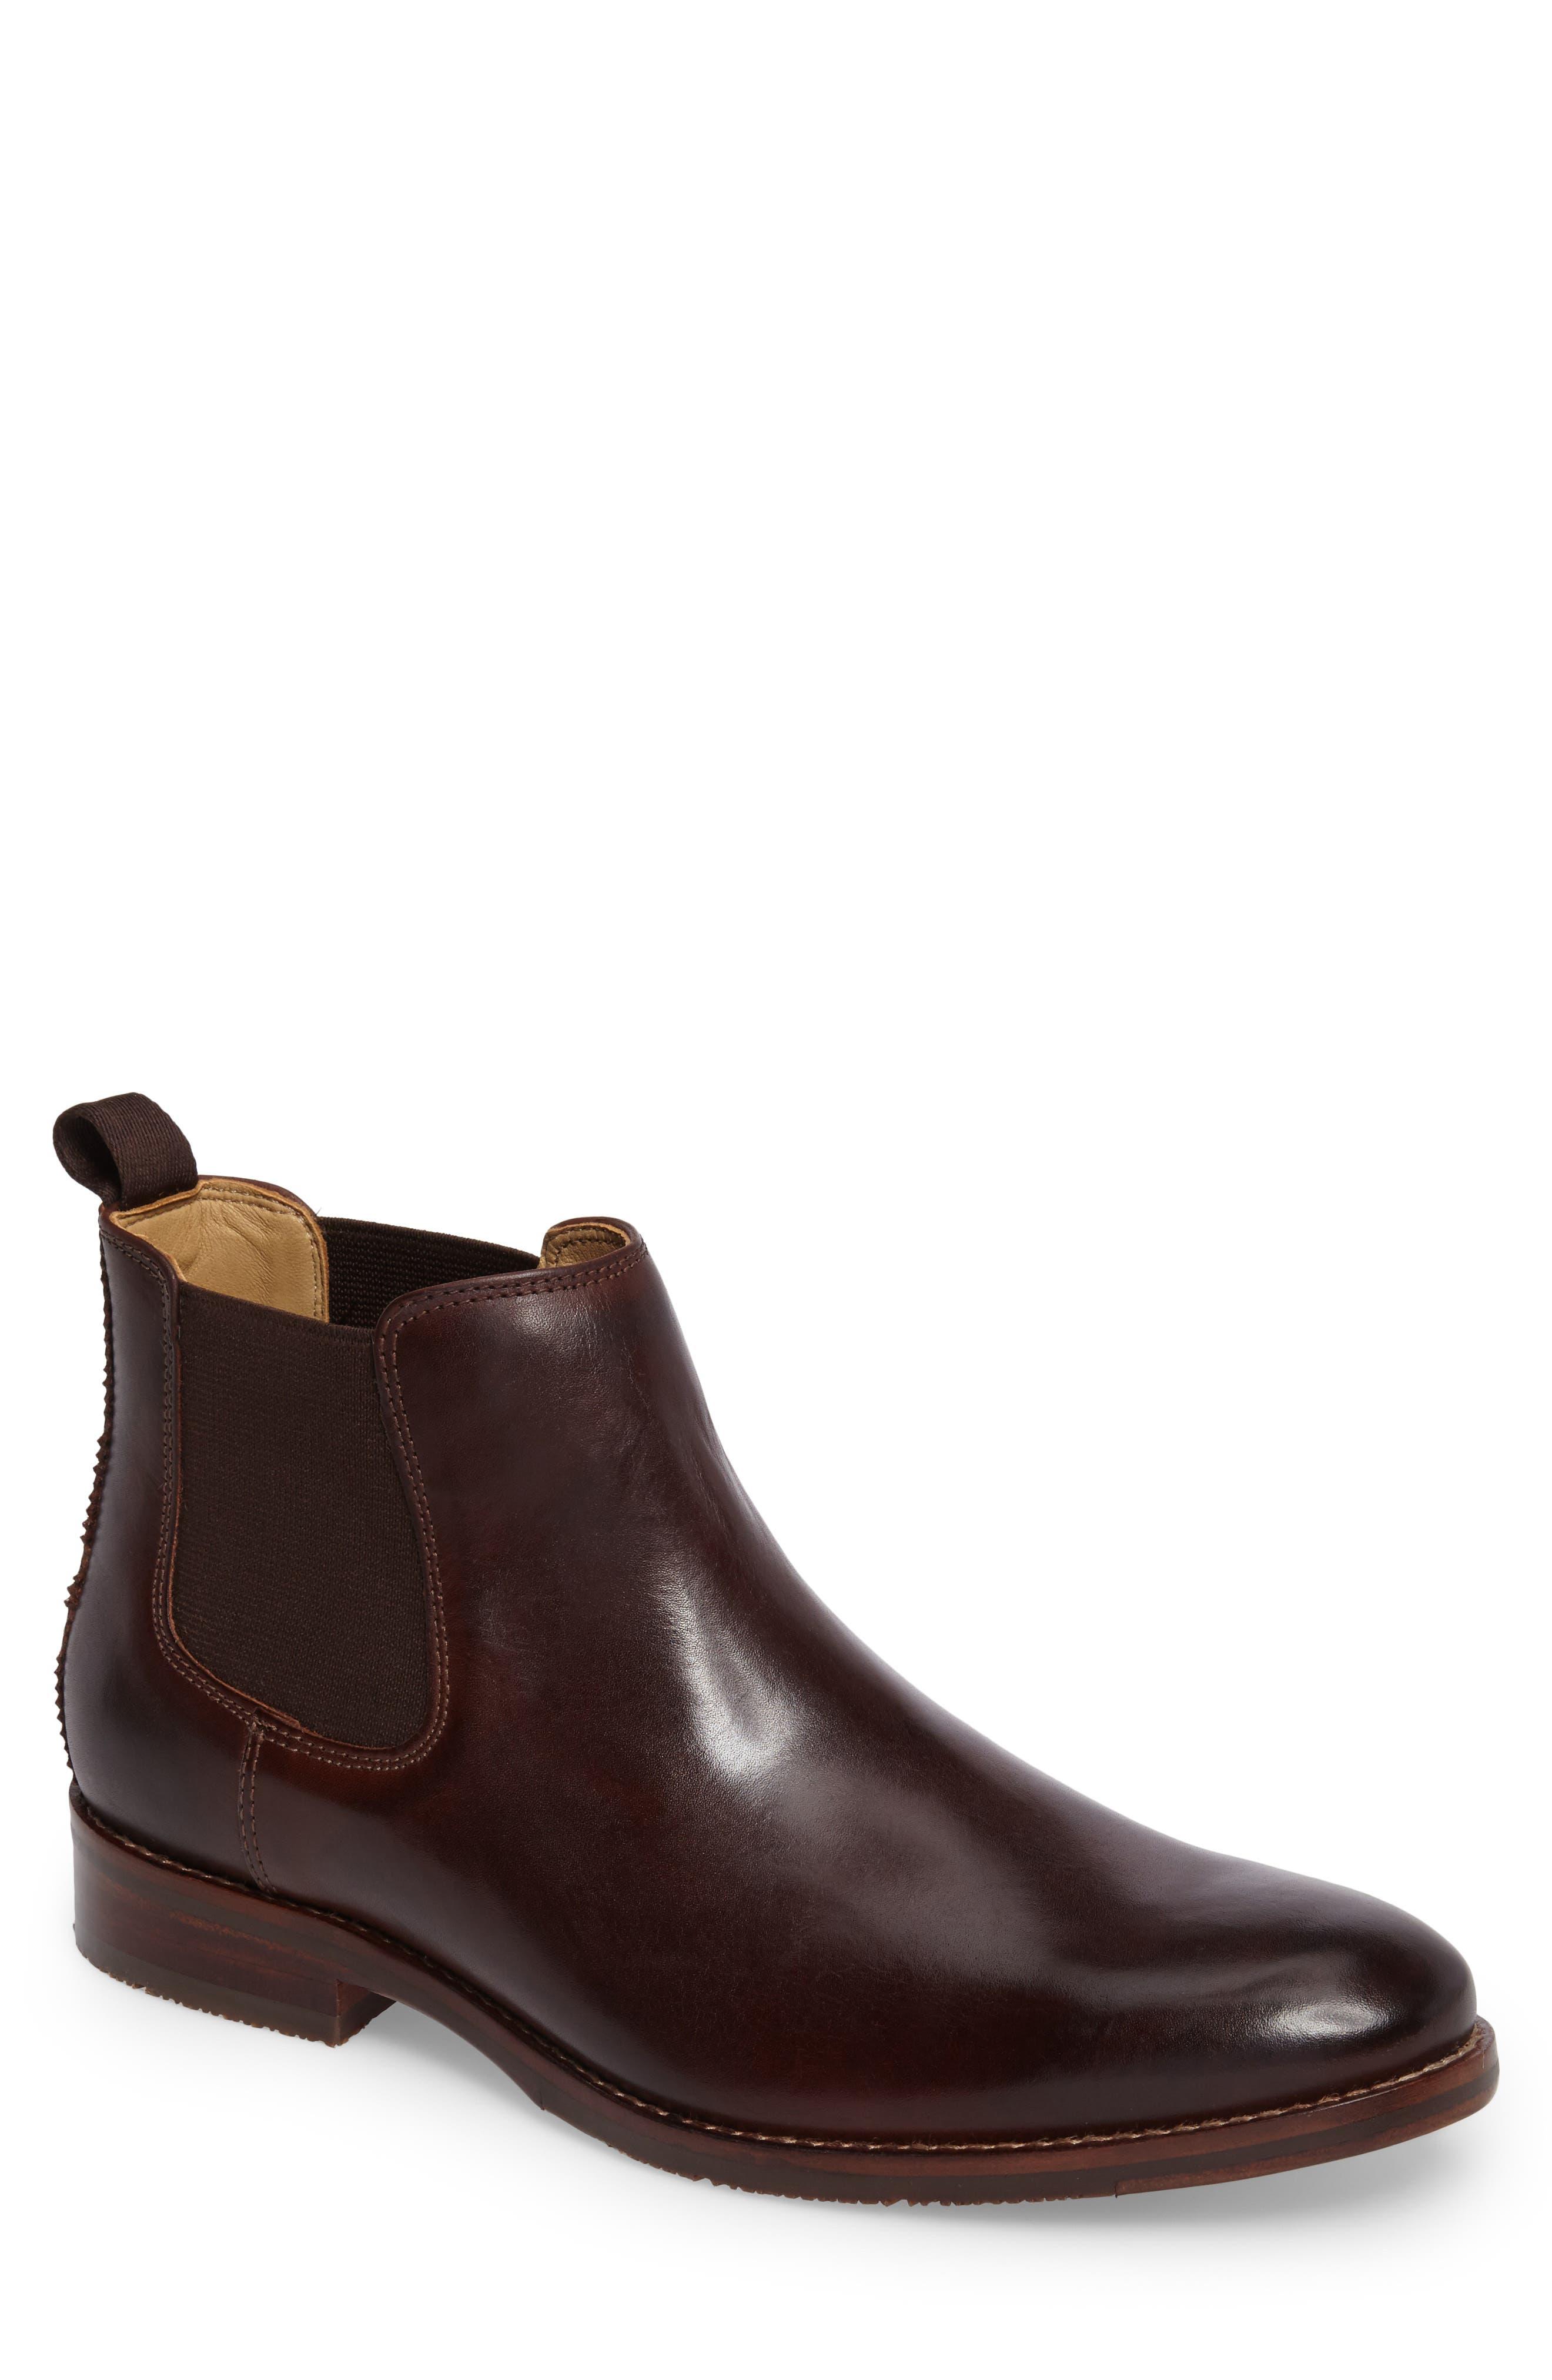 Garner Chelsea Boot,                         Main,                         color, Mahogany Leather